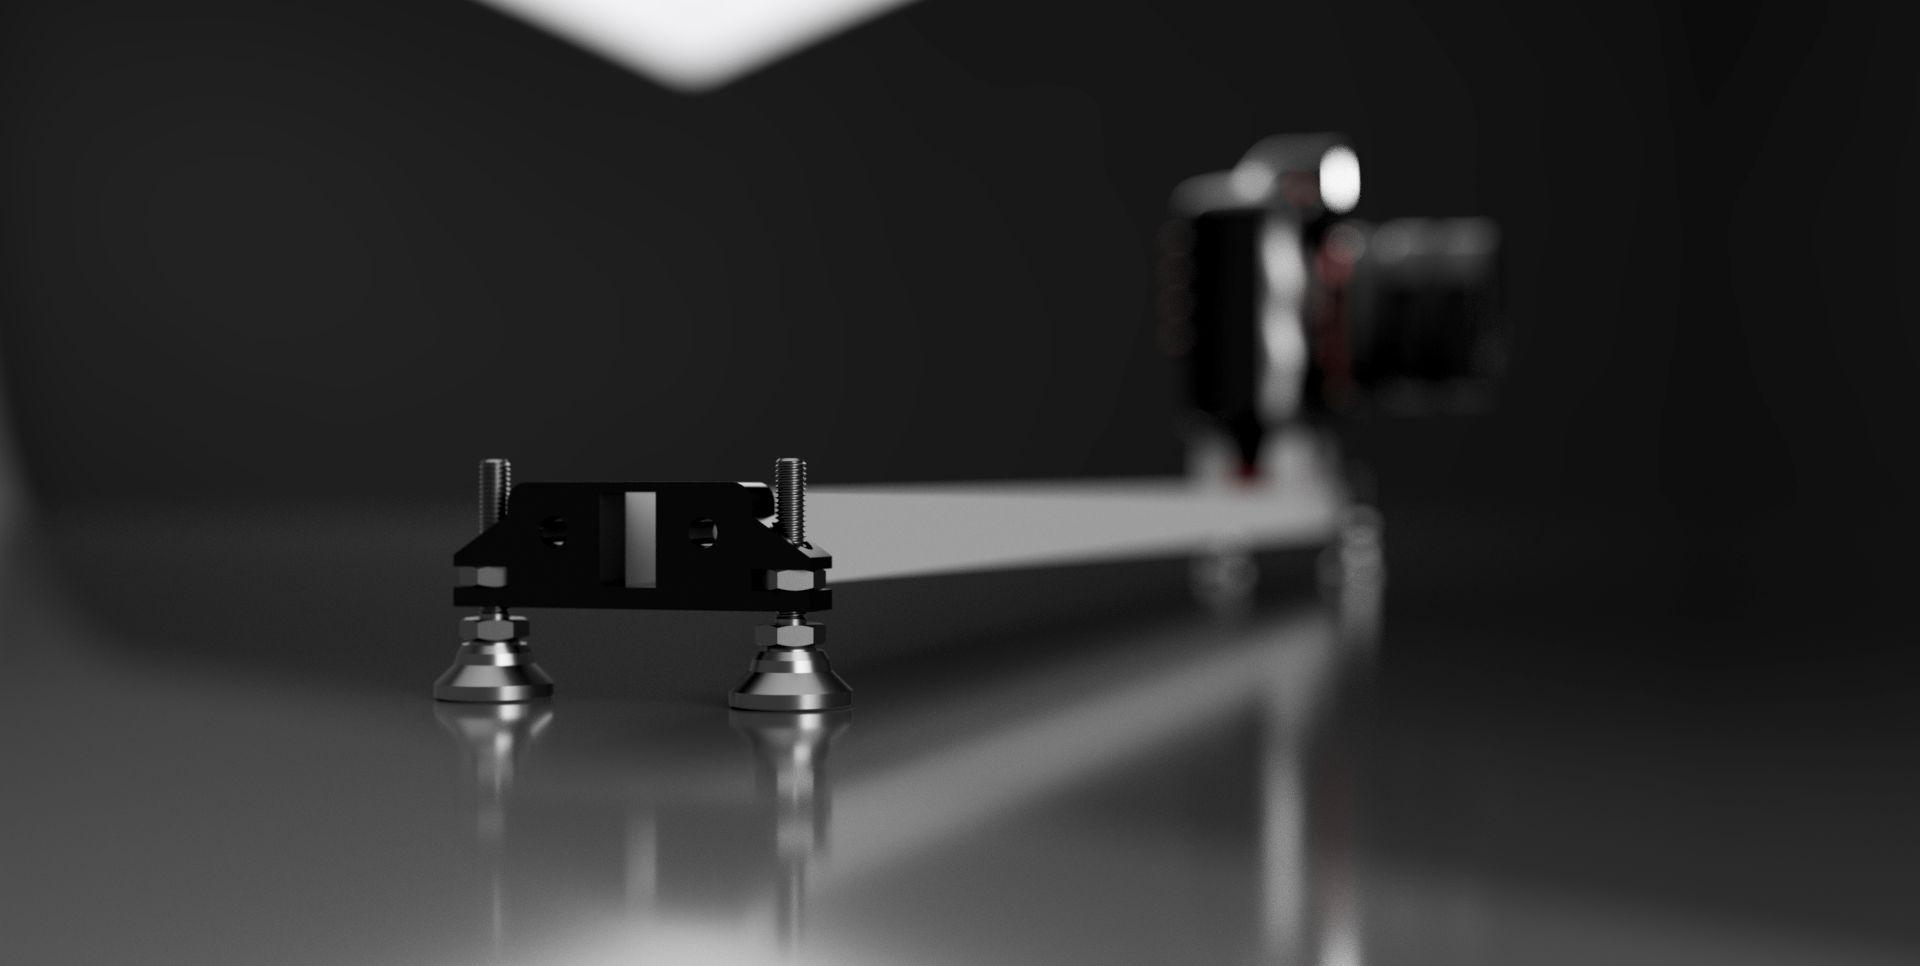 Camera-slide-rail-v7-1-3500-3500